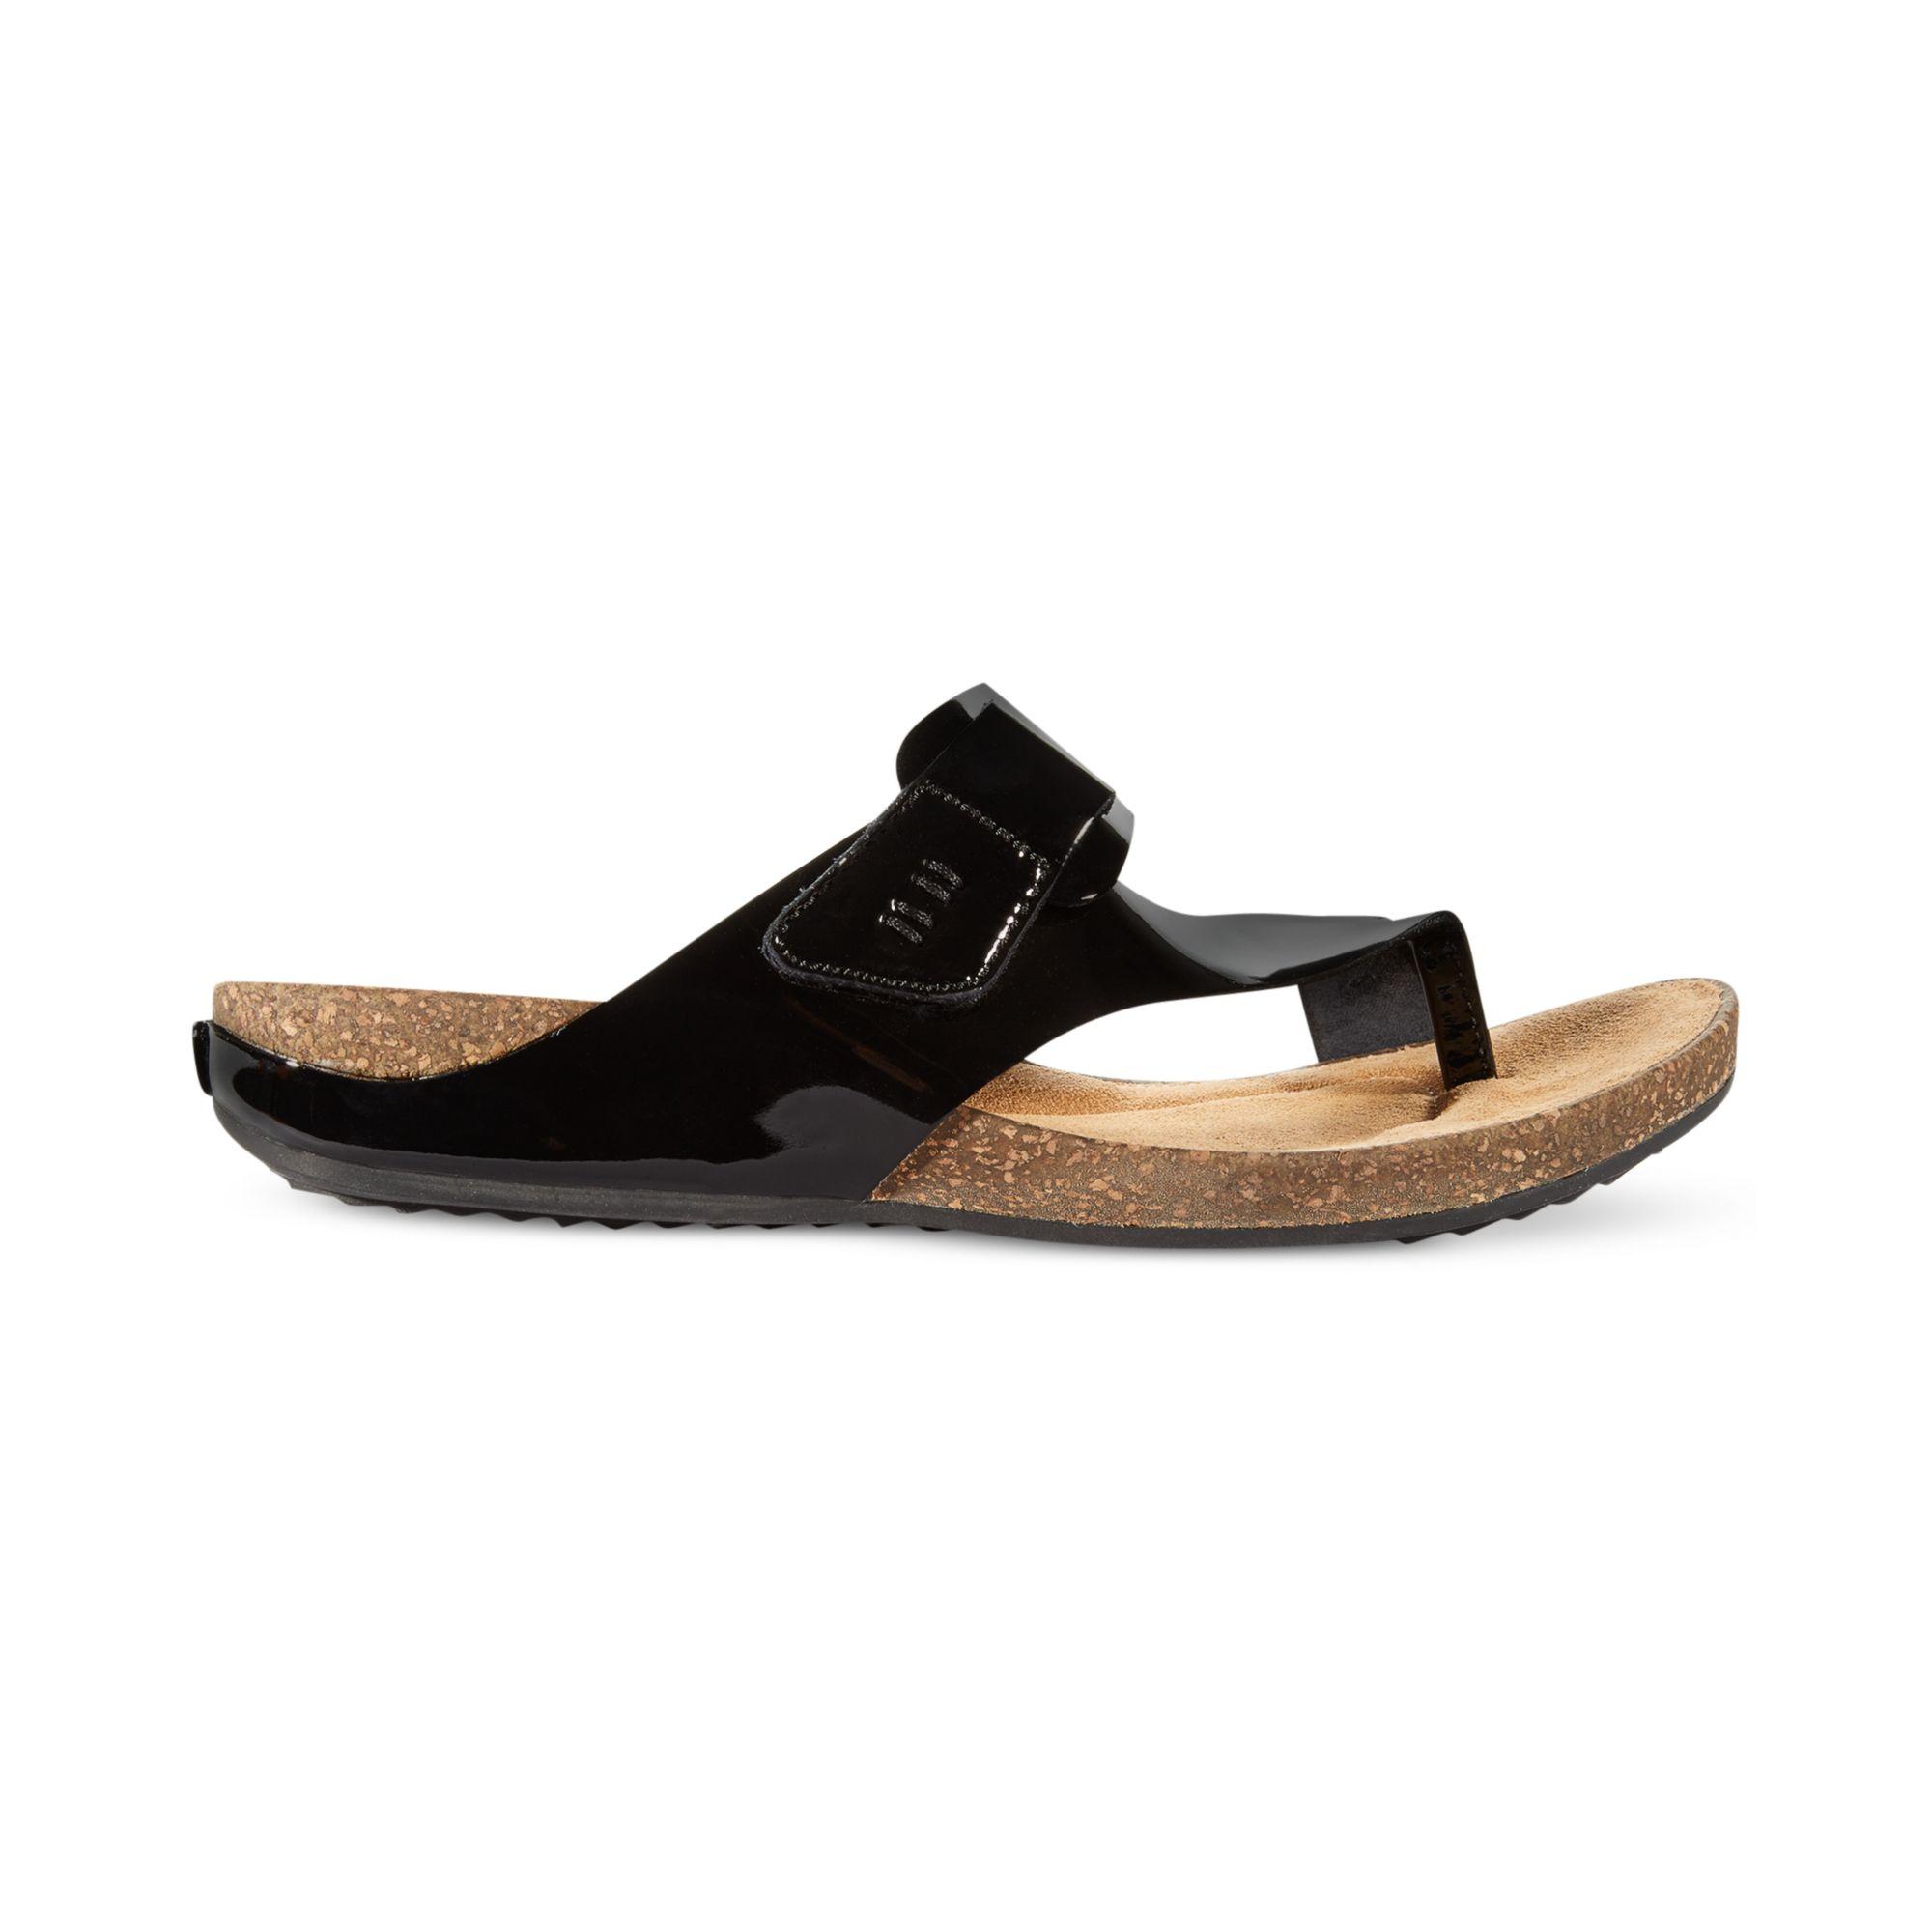 c219b886ef73 Lyst - Clarks Womens Artisan Perri Coast Footbed Sandals in Black